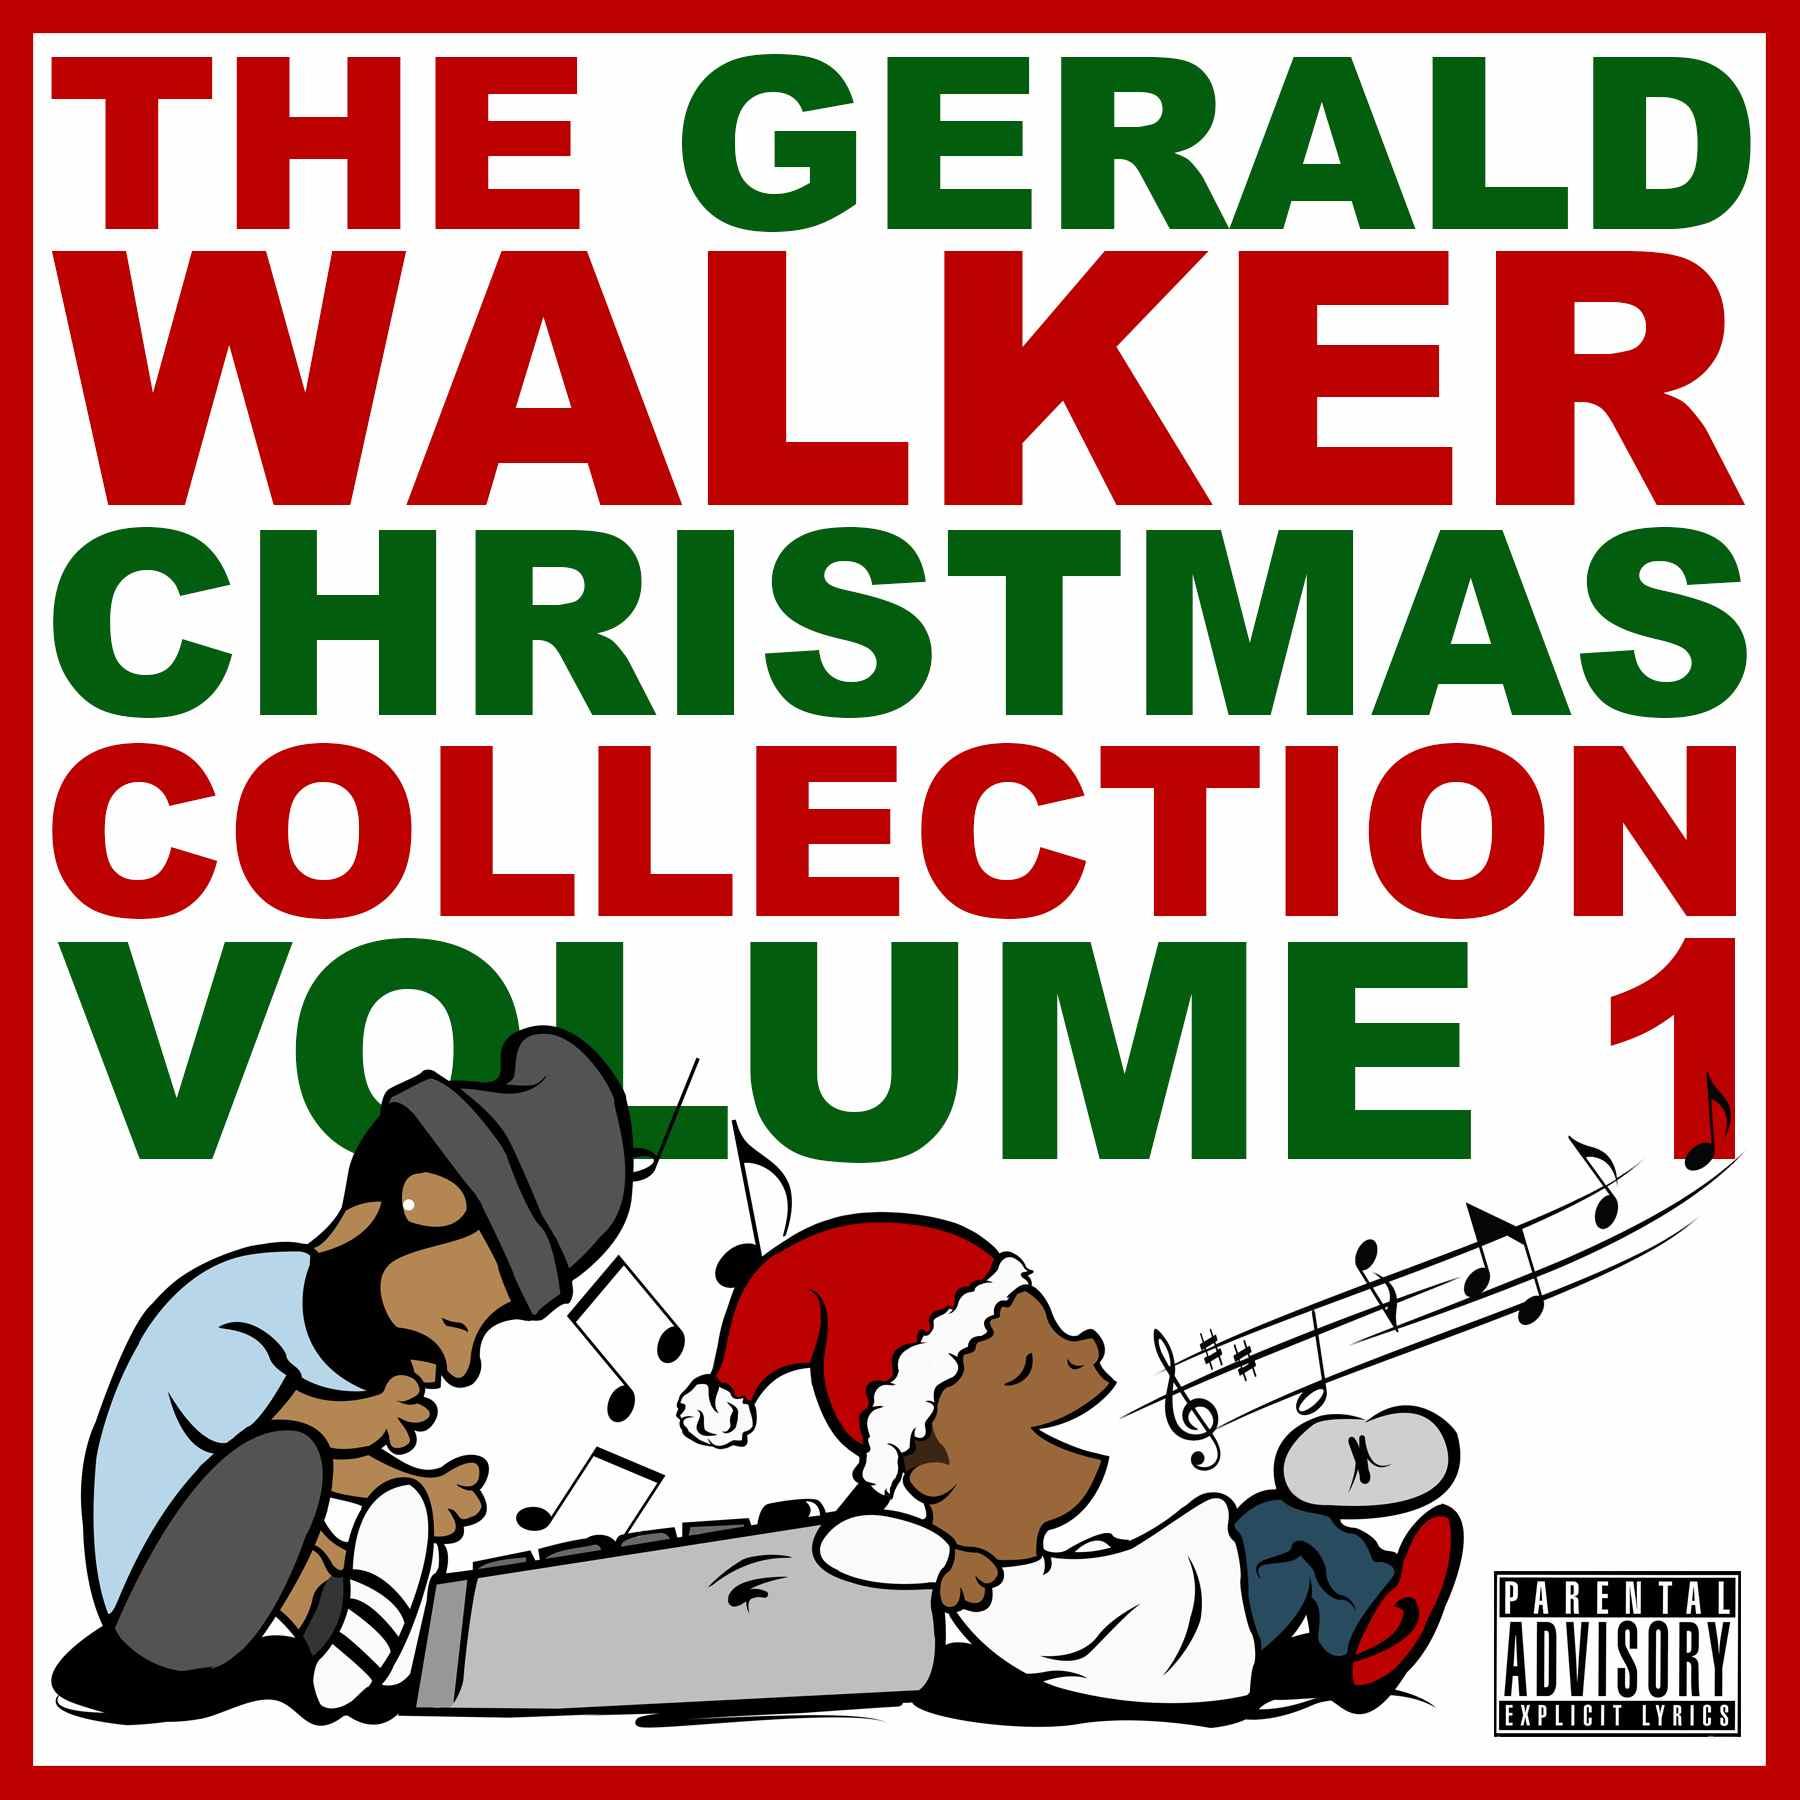 Christmas Collection Vol. 1